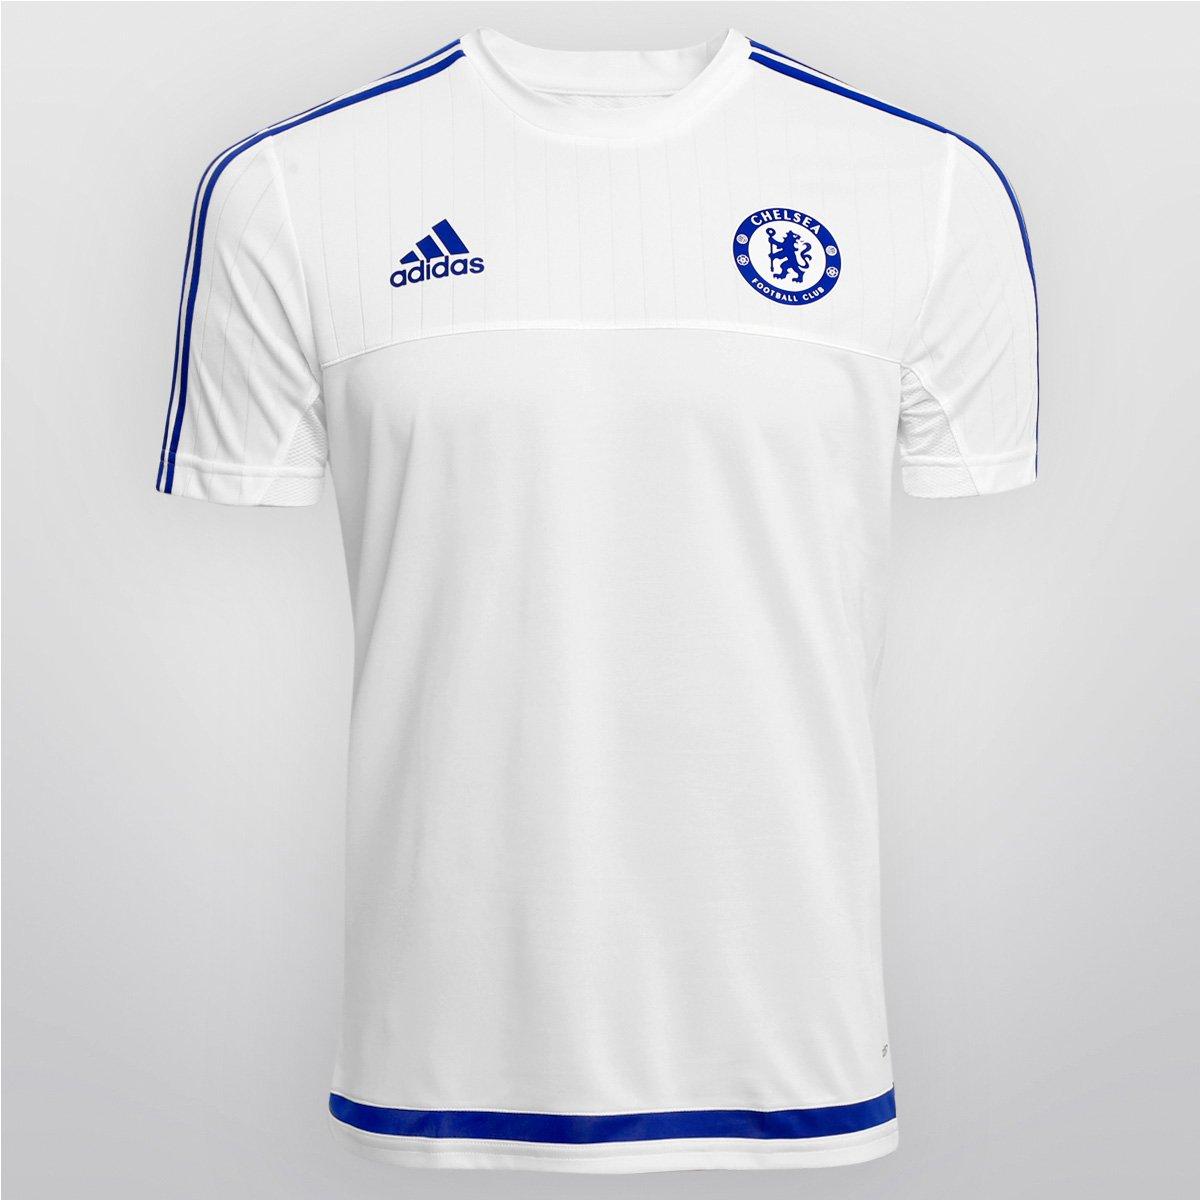 5c4698d76d Camisa de Treino Chelsea 2015 Adidas Masculina - Compre Agora